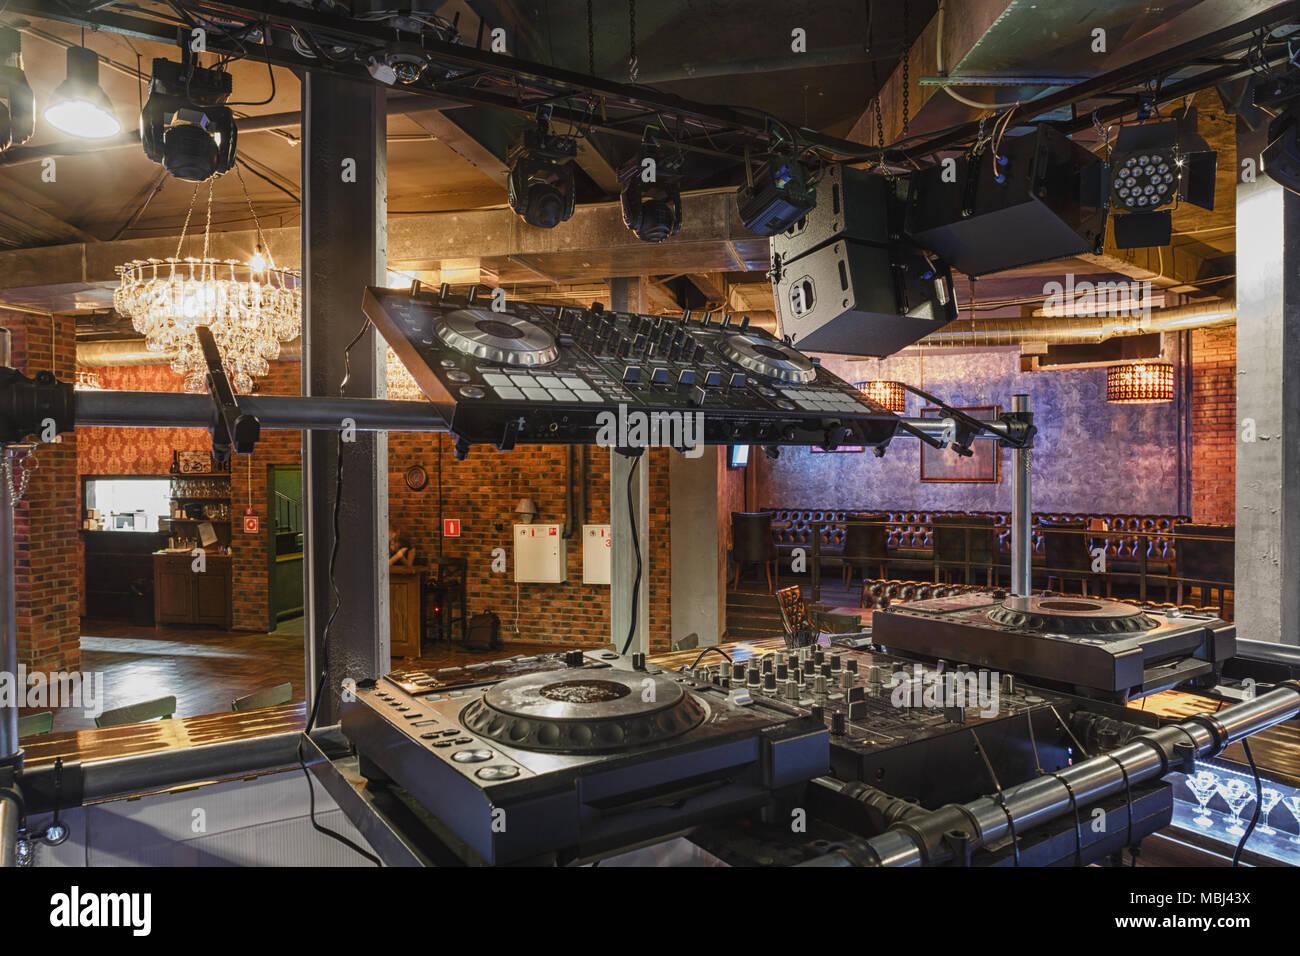 Nightclub interior design stock photos